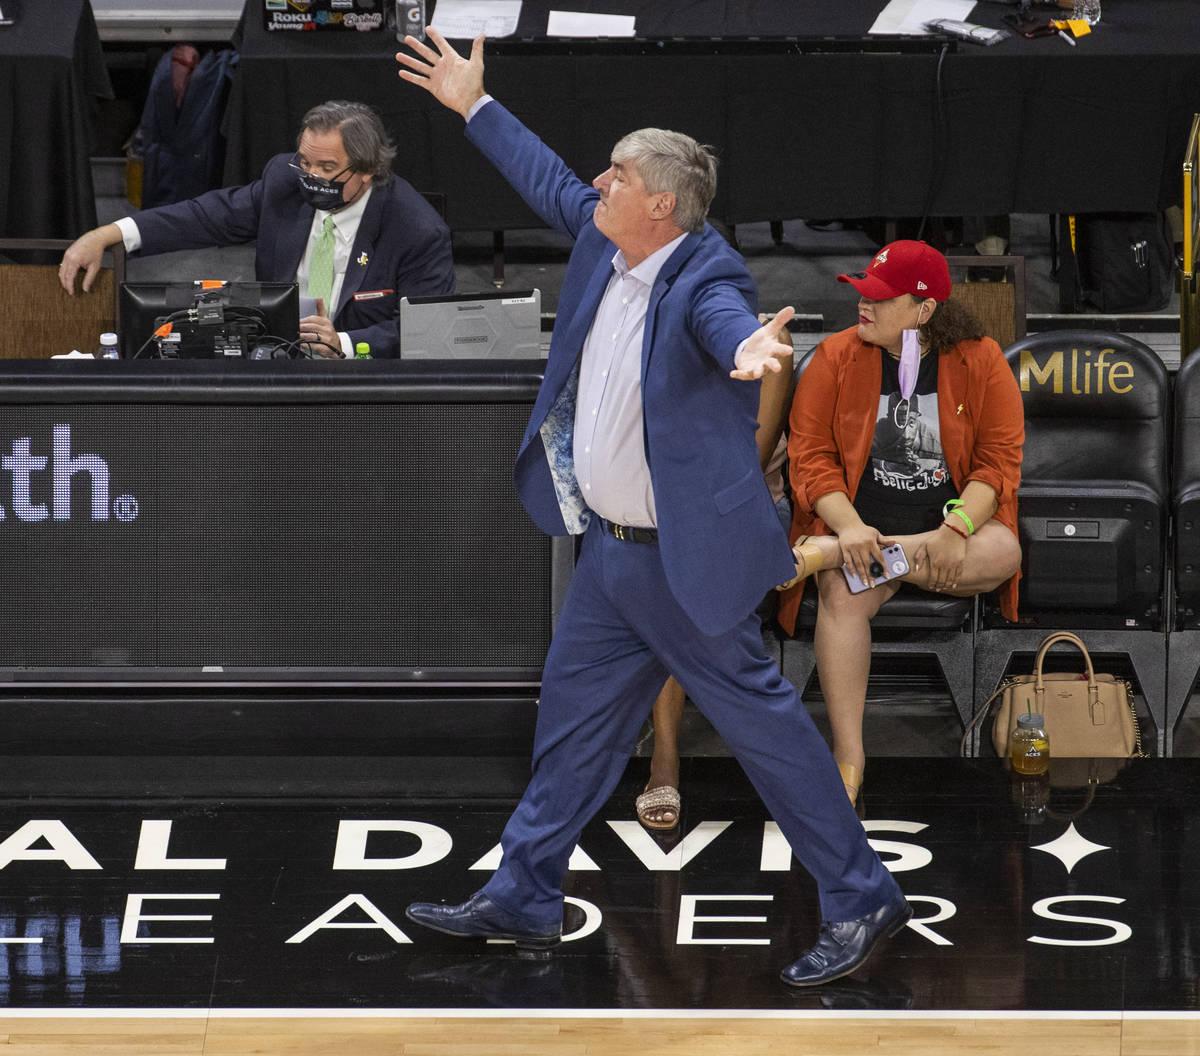 El entrenador de Las Vegas Aces, Bill Laimbeer, impugna una falta contra las New York Liberty d ...